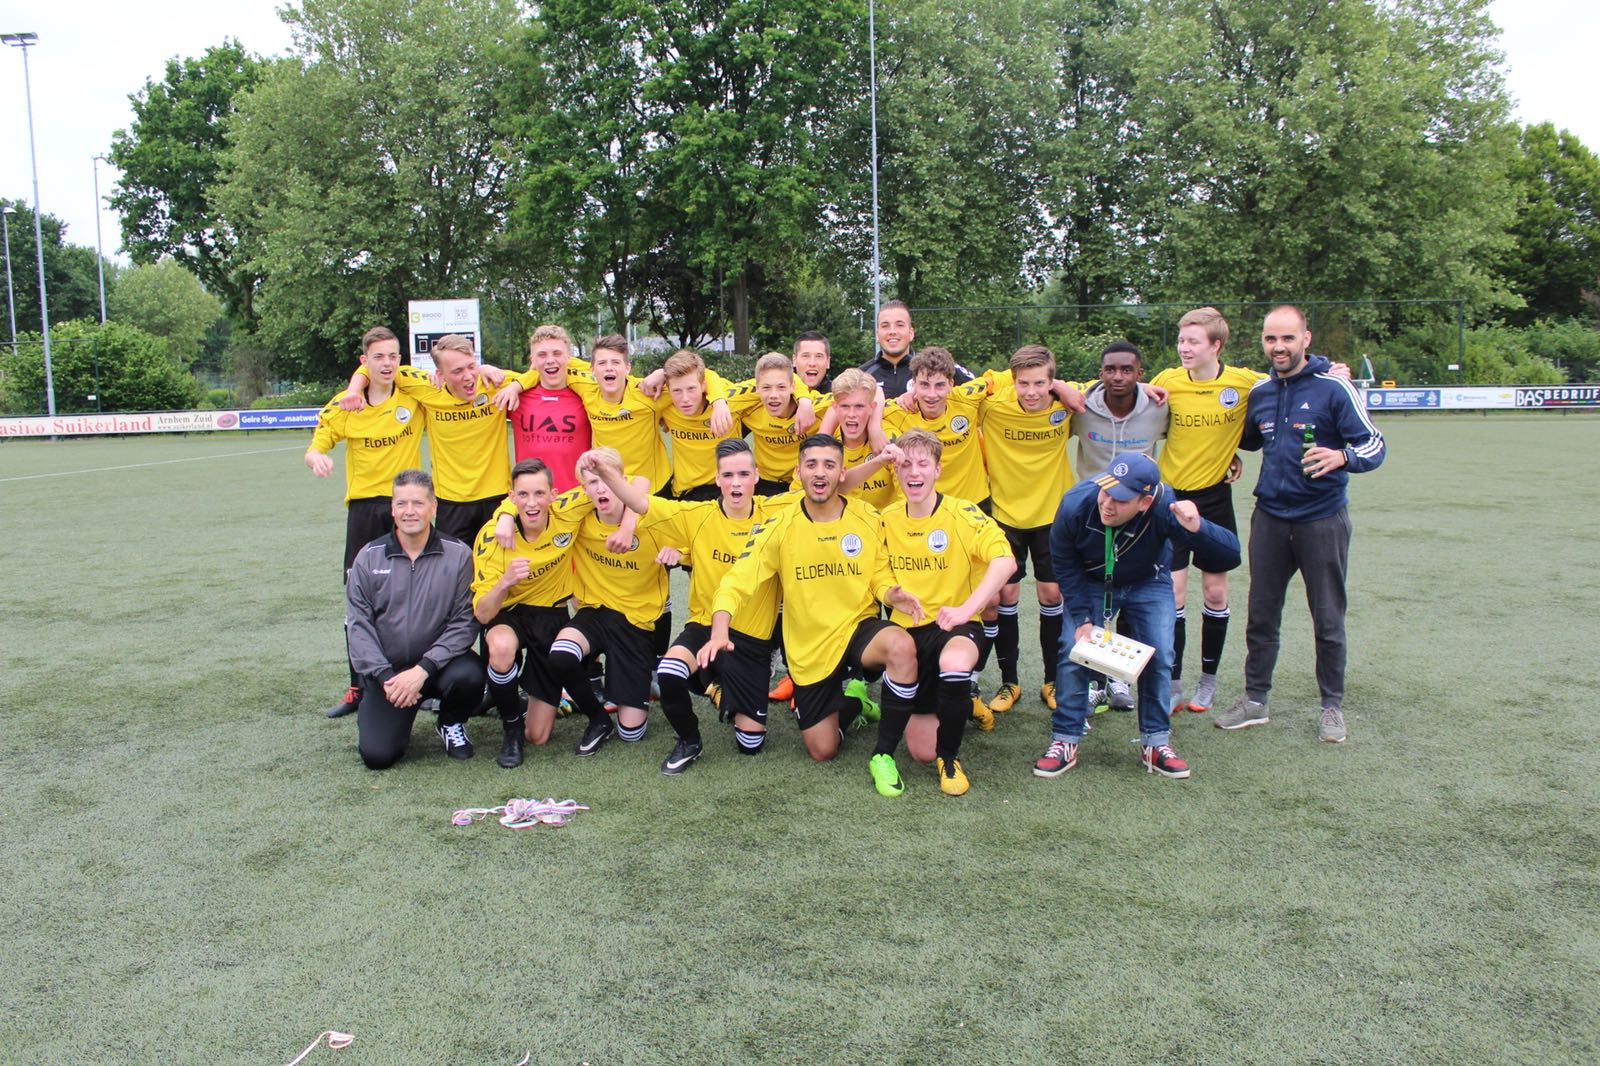 Eldenia JO17-1 kampioen!